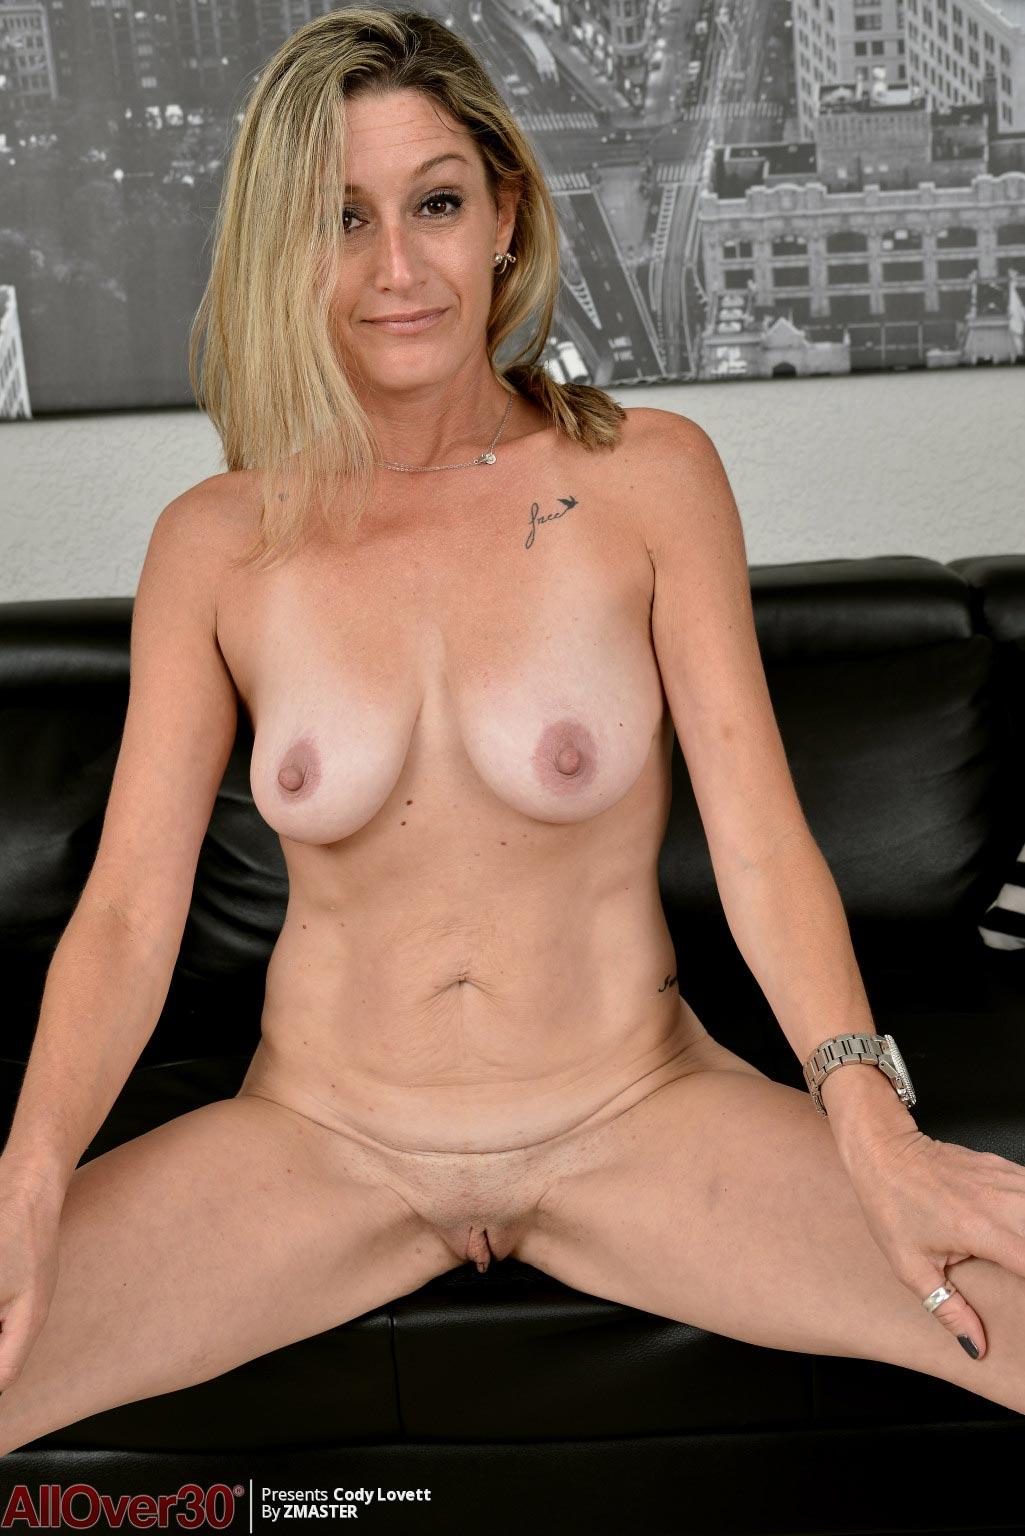 Naked Redhead Lesbians | Hot Girl HD Wallpaper